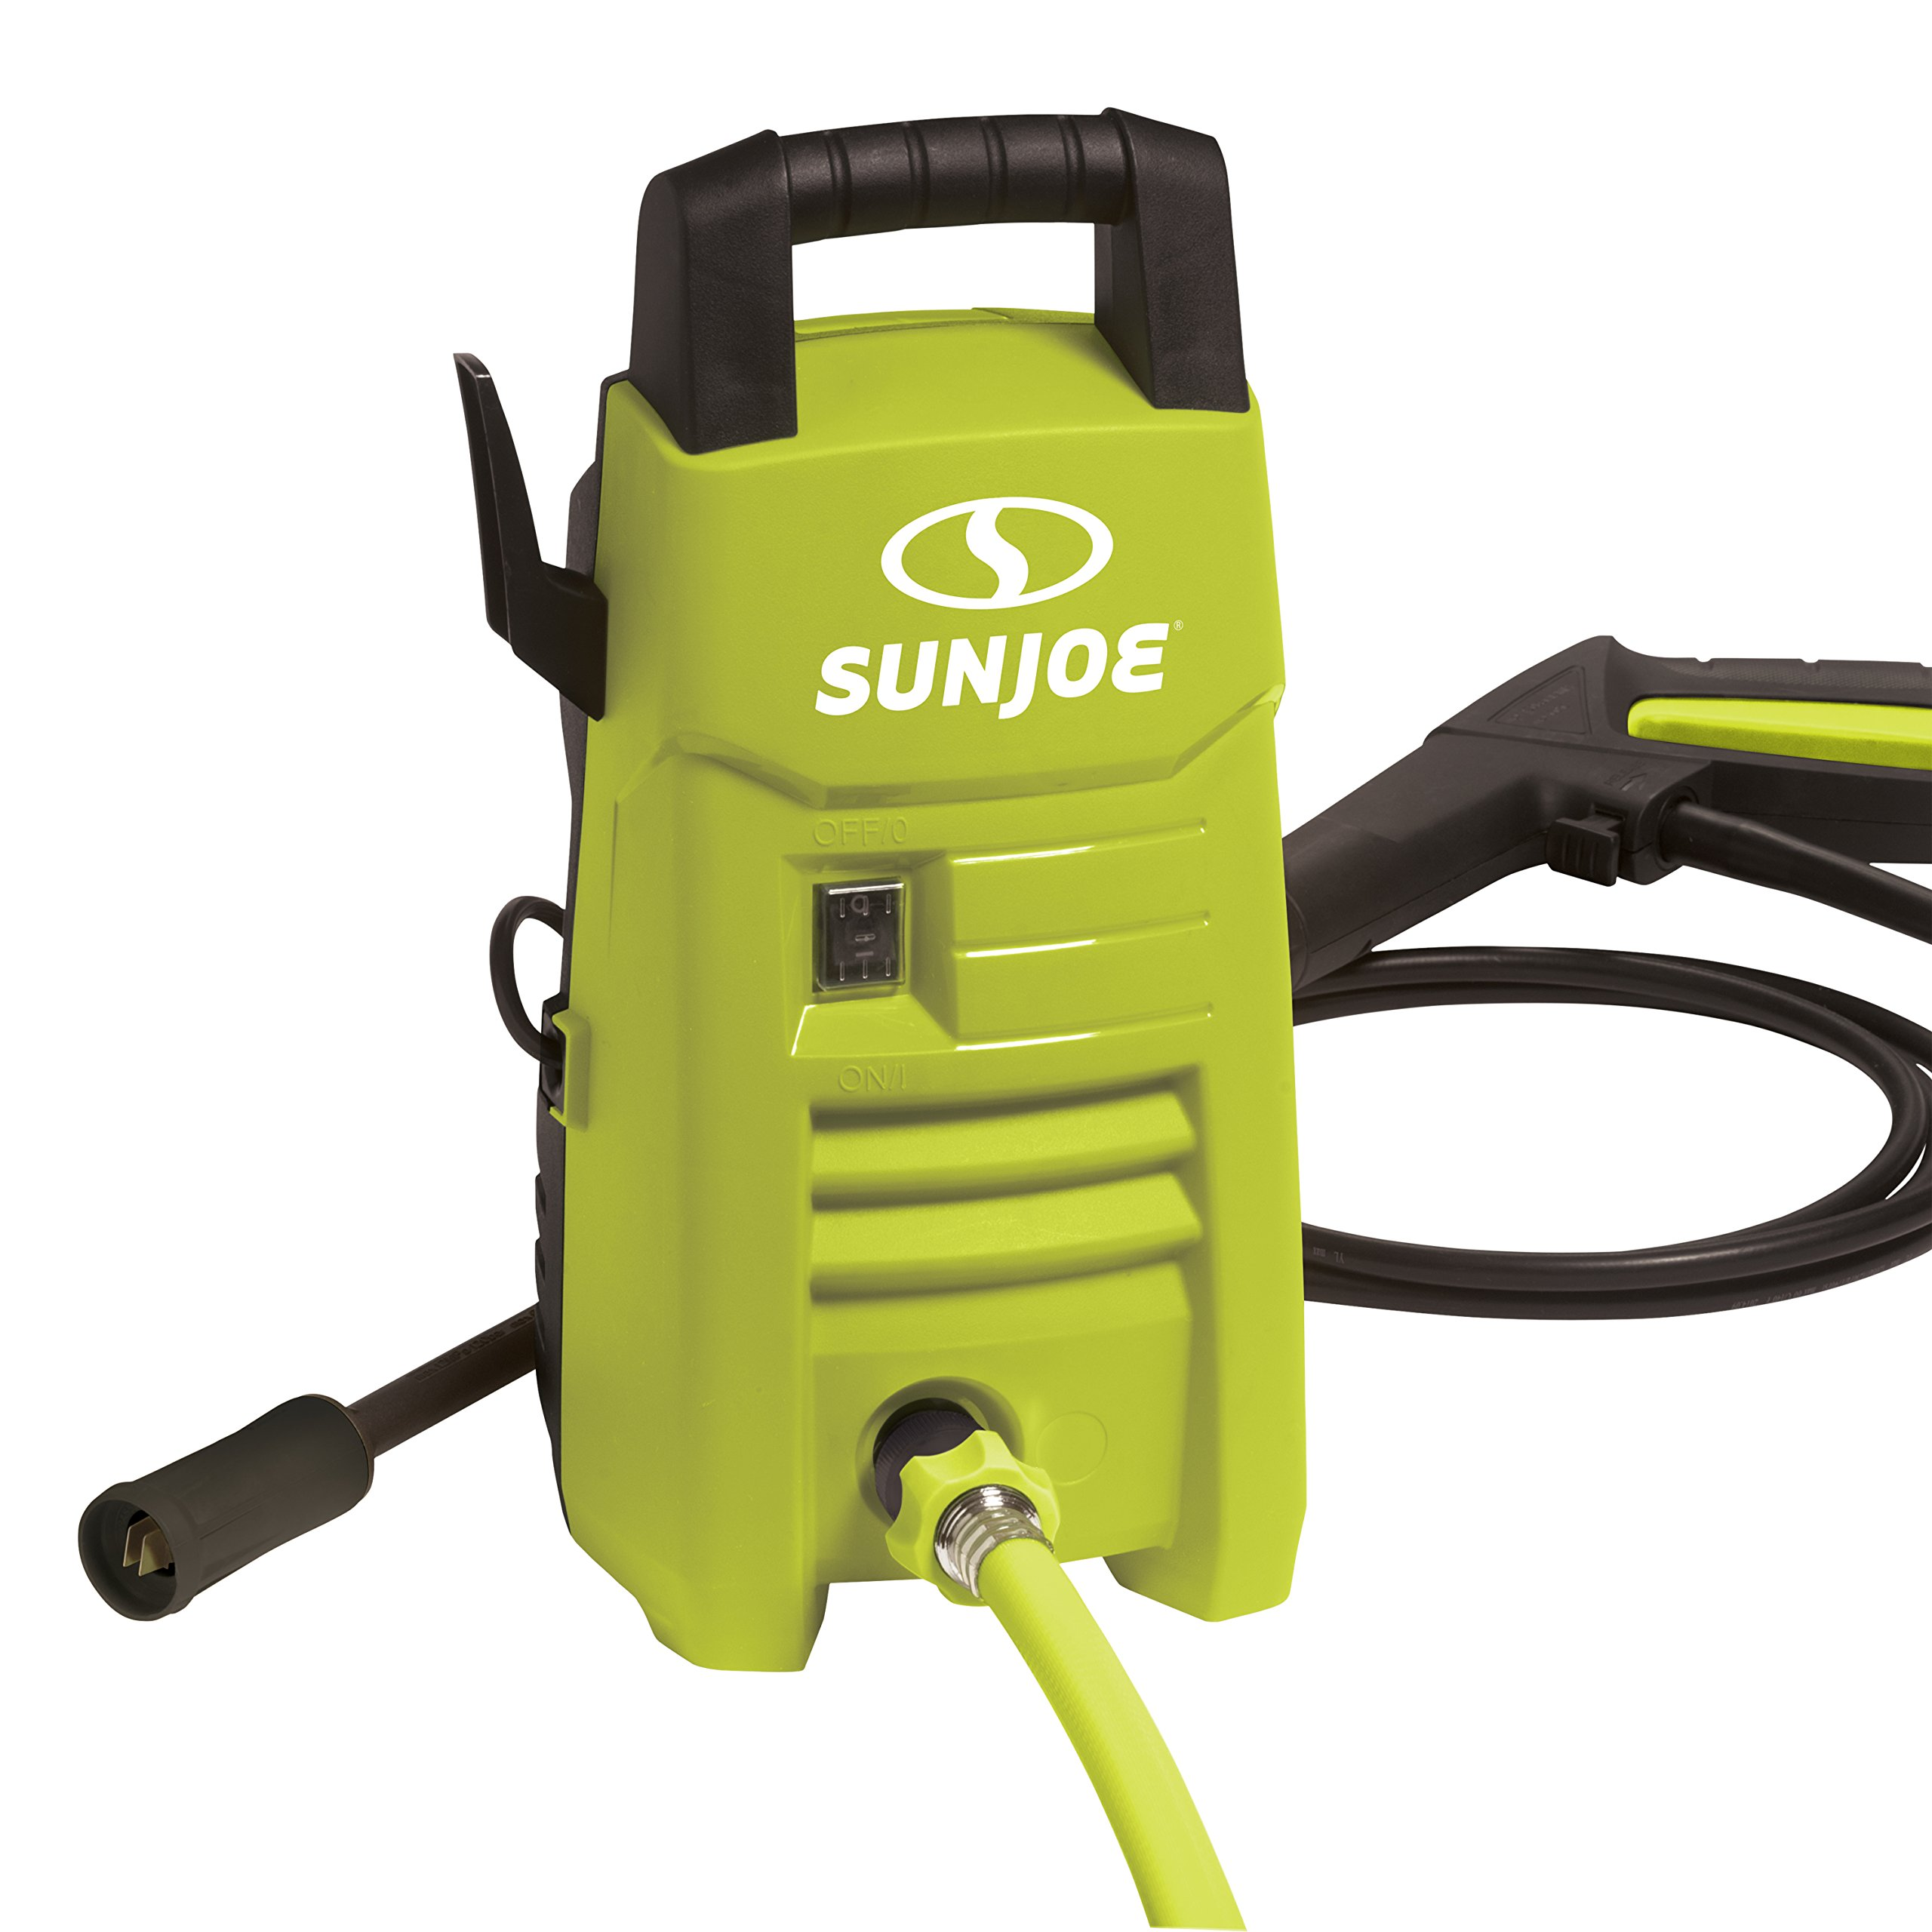 Sun Joe SPX200E 1350 PSI 1.45 GPM 10-Amp Electric Pressure Washer by Snow Joe (Image #2)